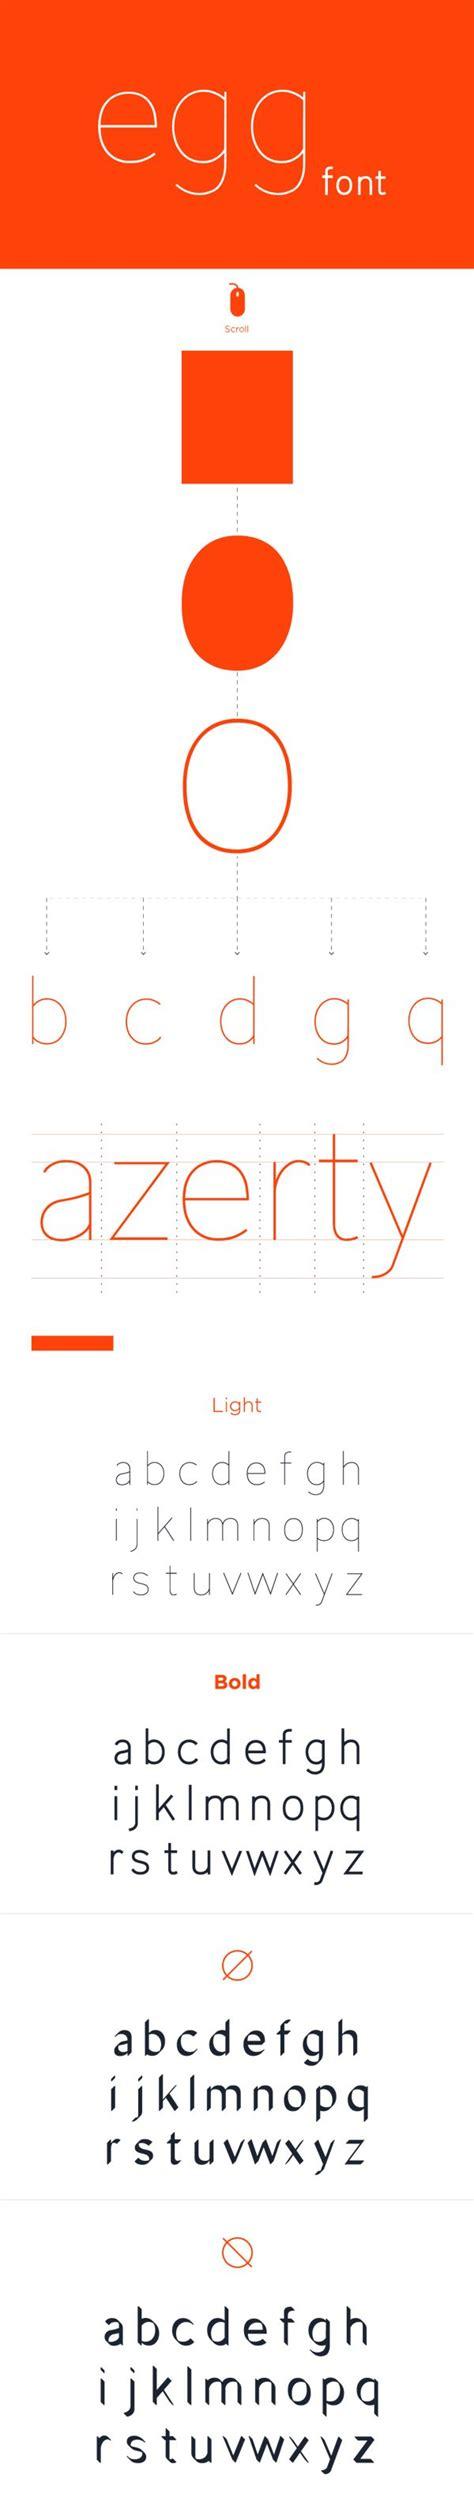 design kotf font behance 통해 비비안 베르에 의해 계란 글꼴 editorial design